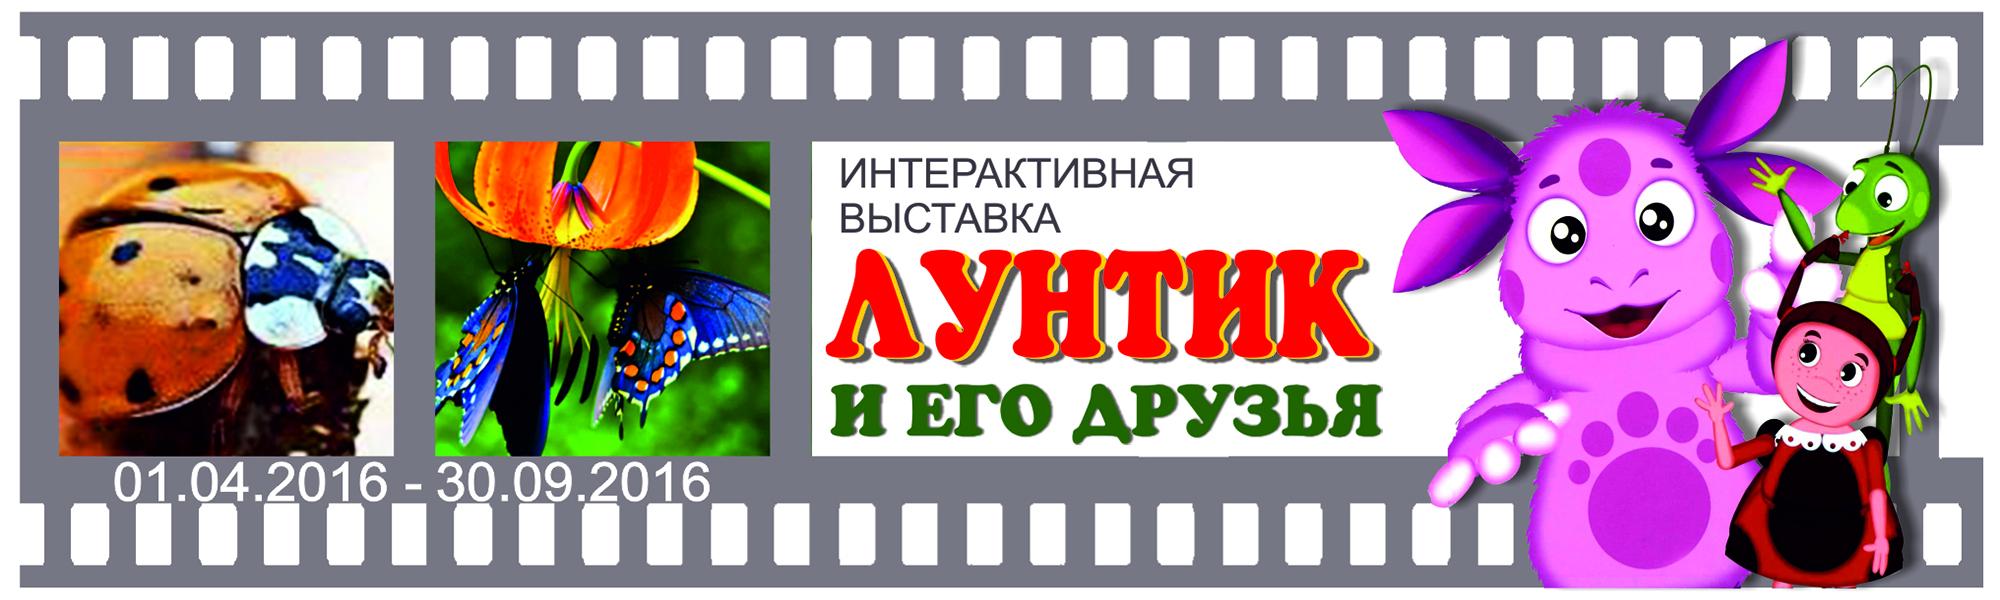 афиша ЛУНТИК сайт